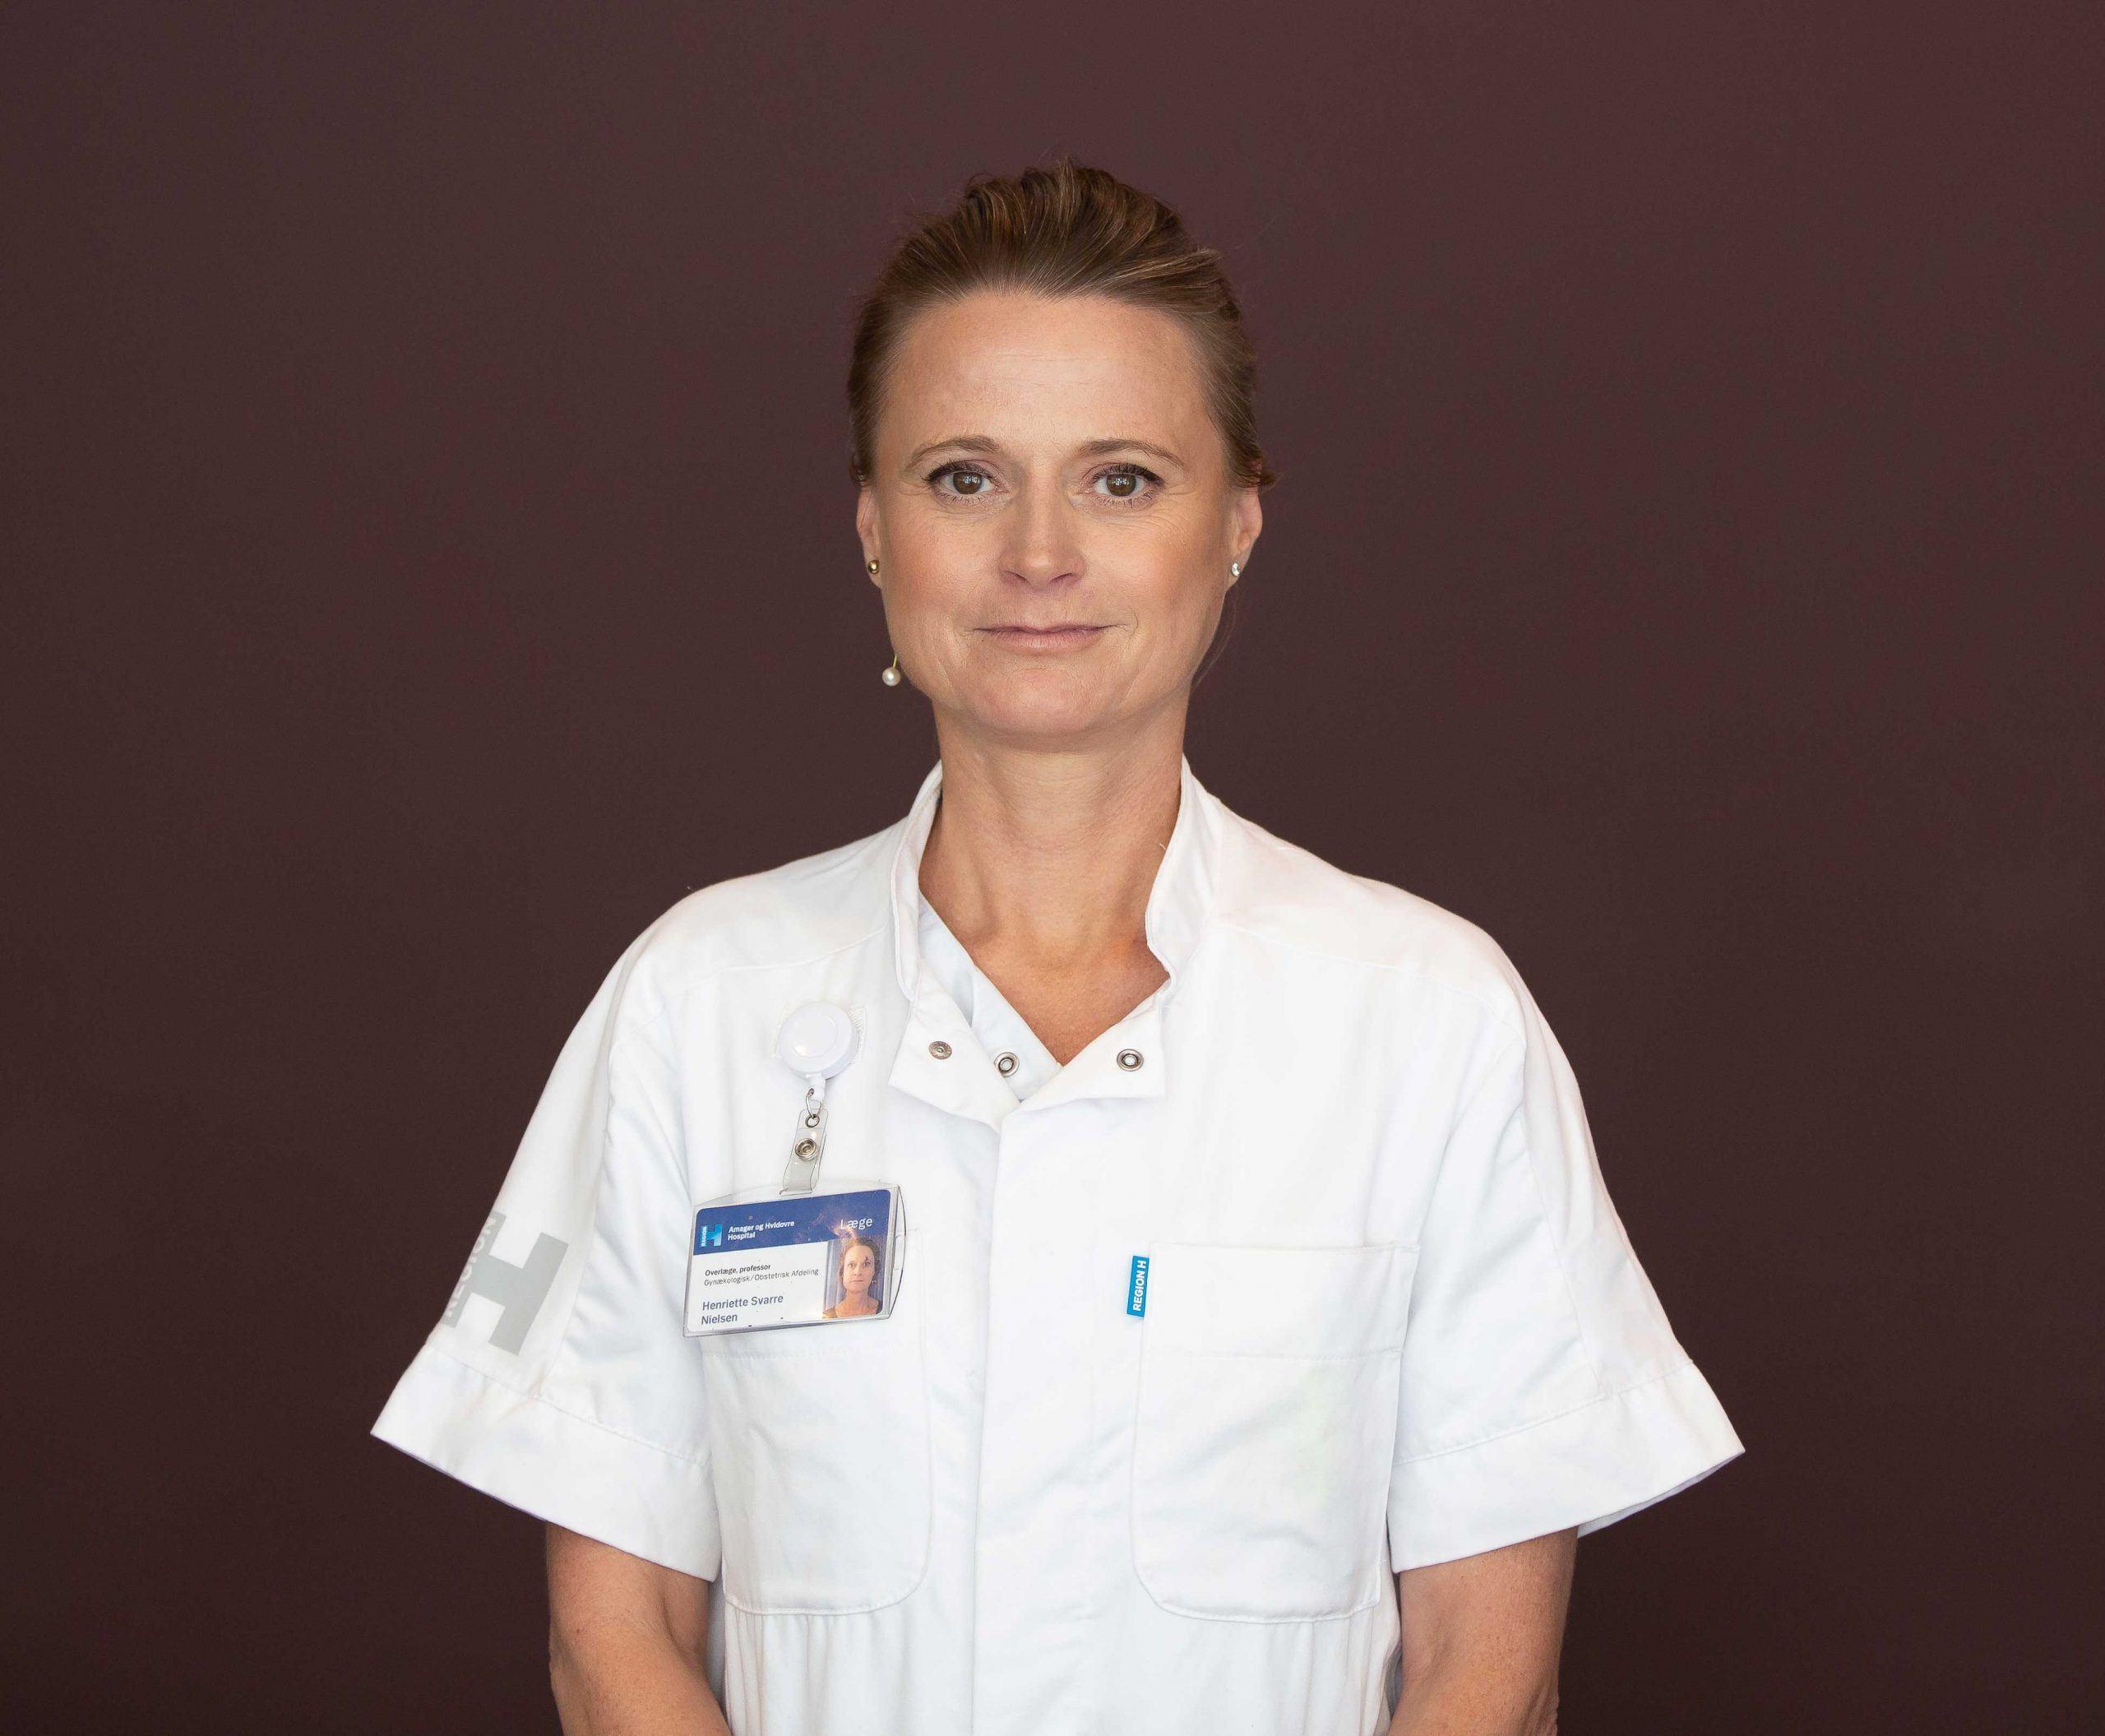 Professor Henriette Svarre Nielsen